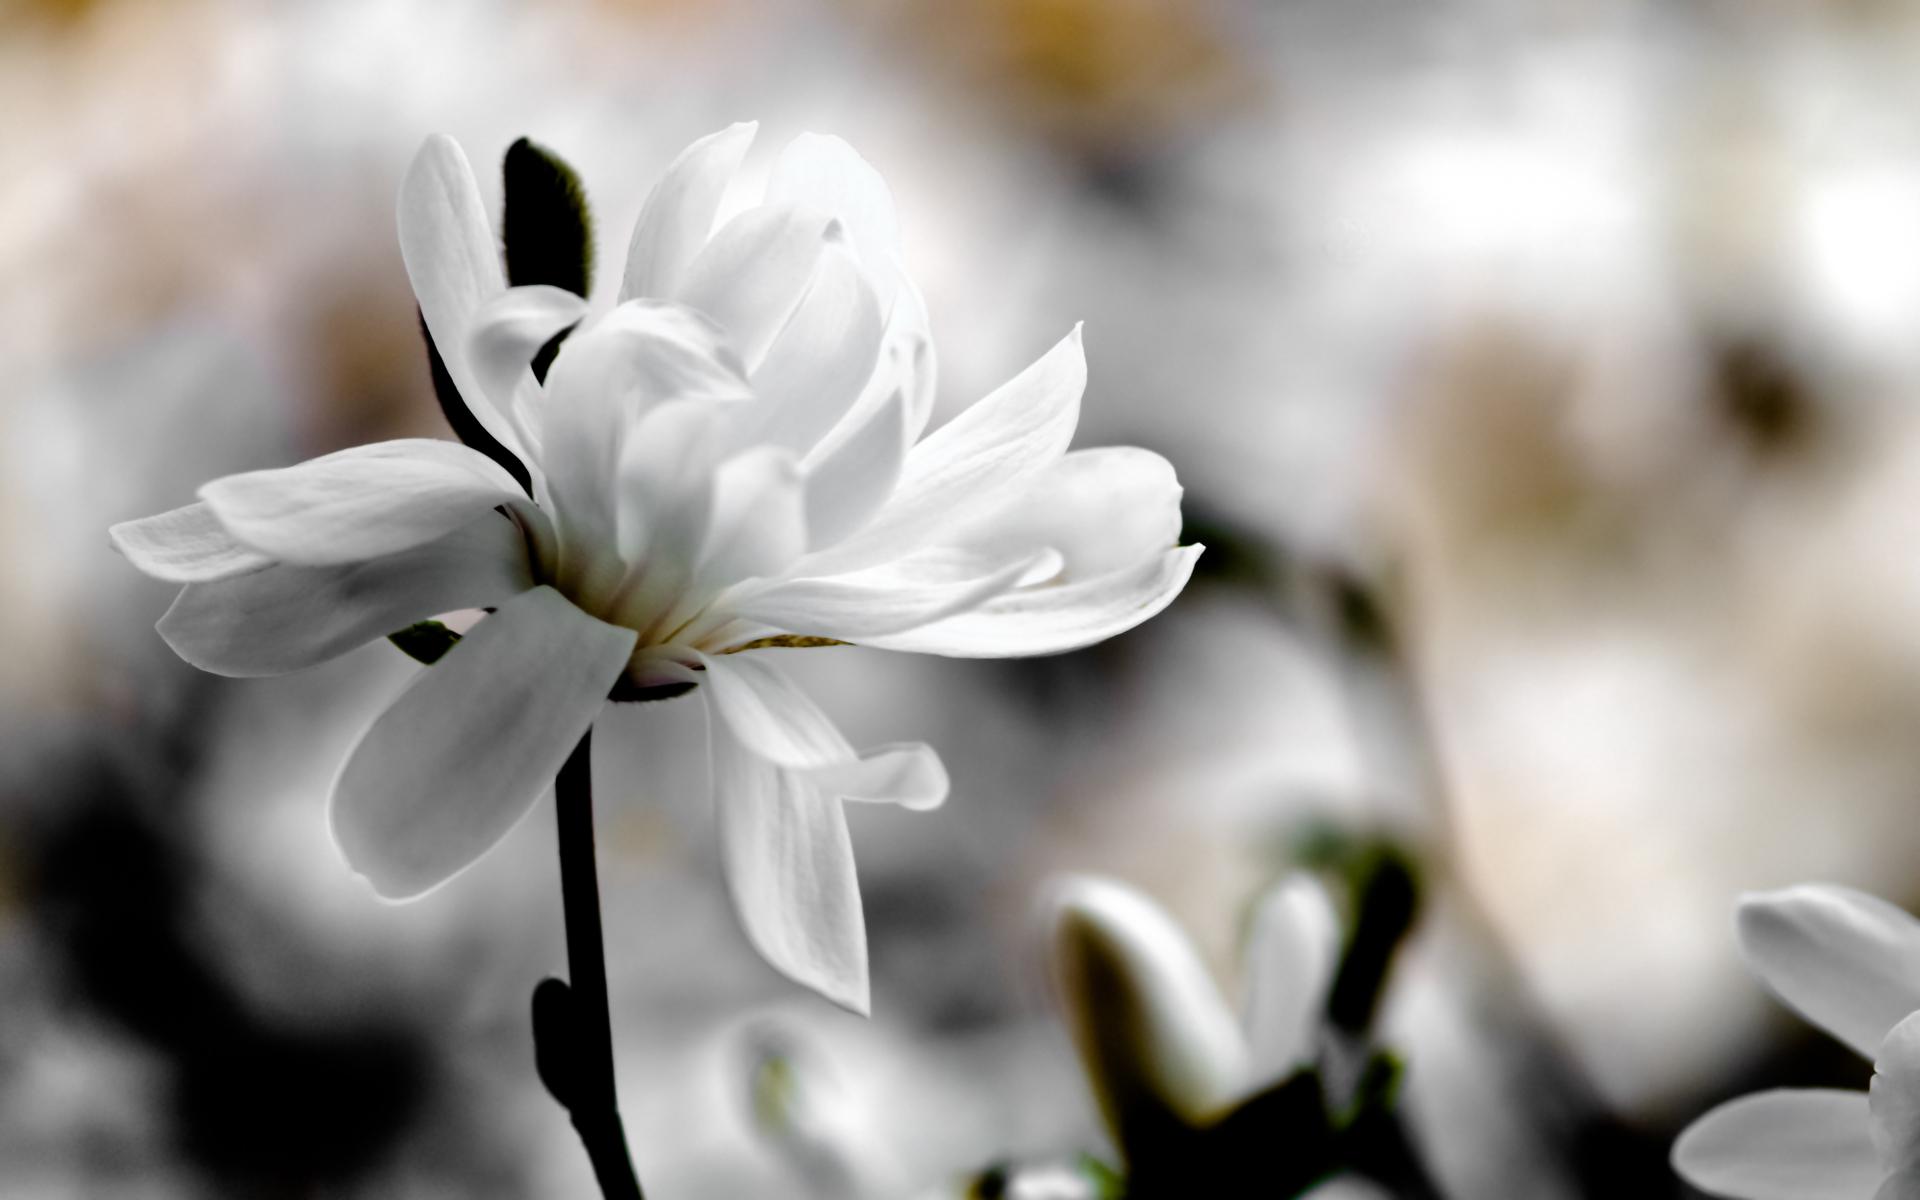 Magnolia, white, background, blur, spring, macro, flowers